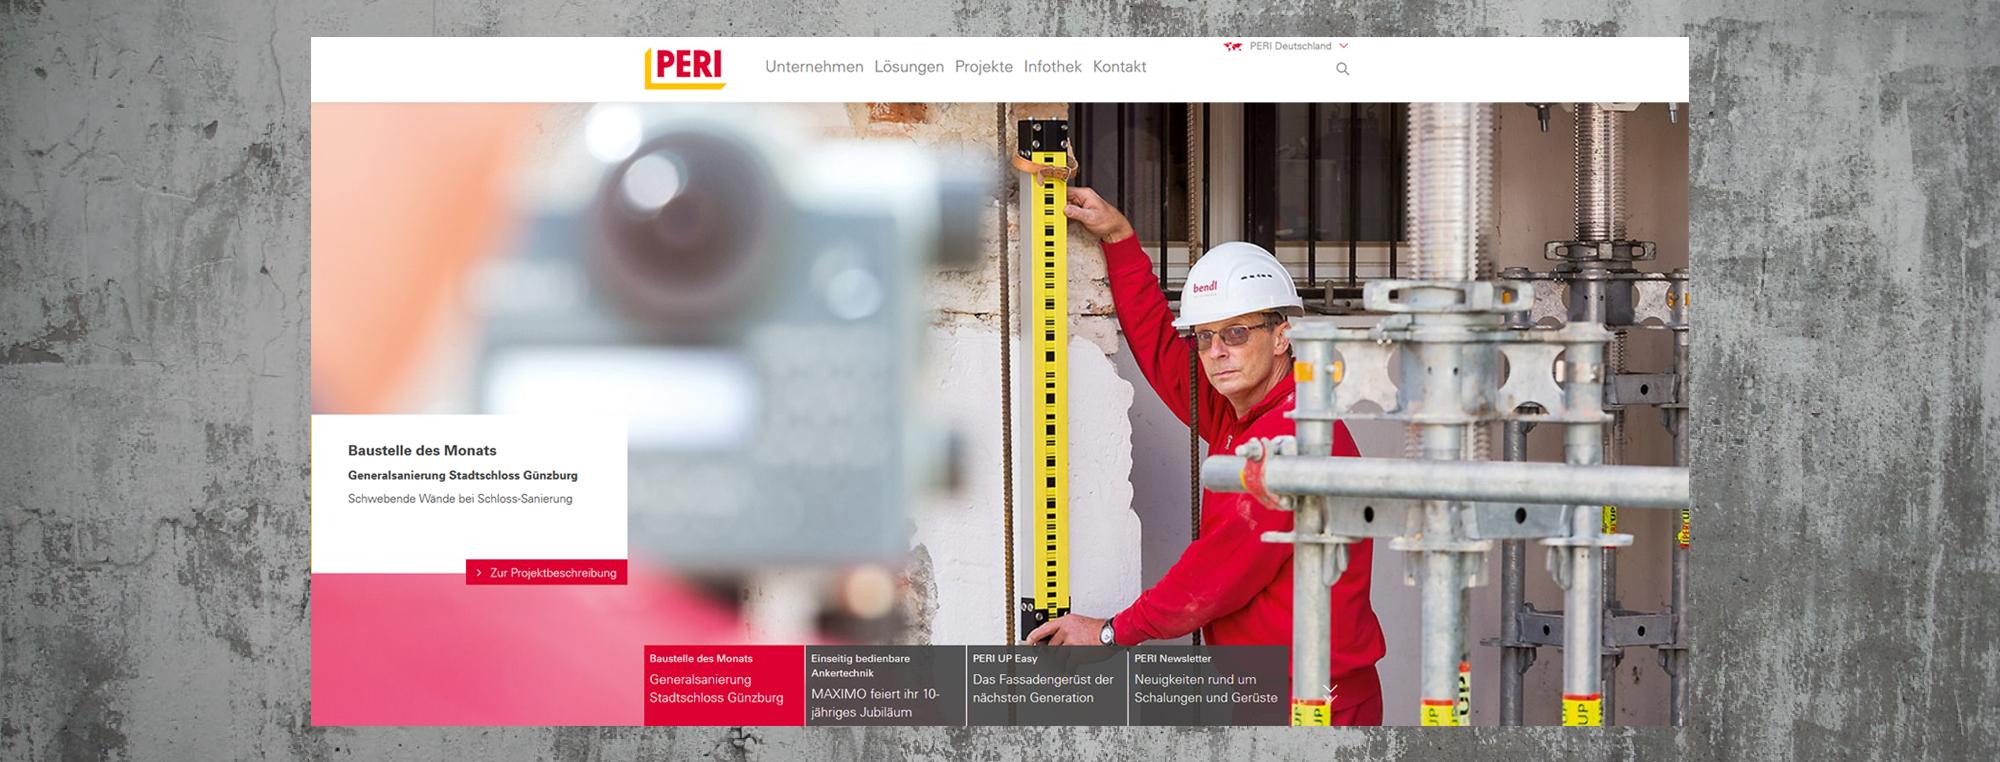 bendl-Baustelle ist Baustelle des Monats Dezember 2017 bei PER